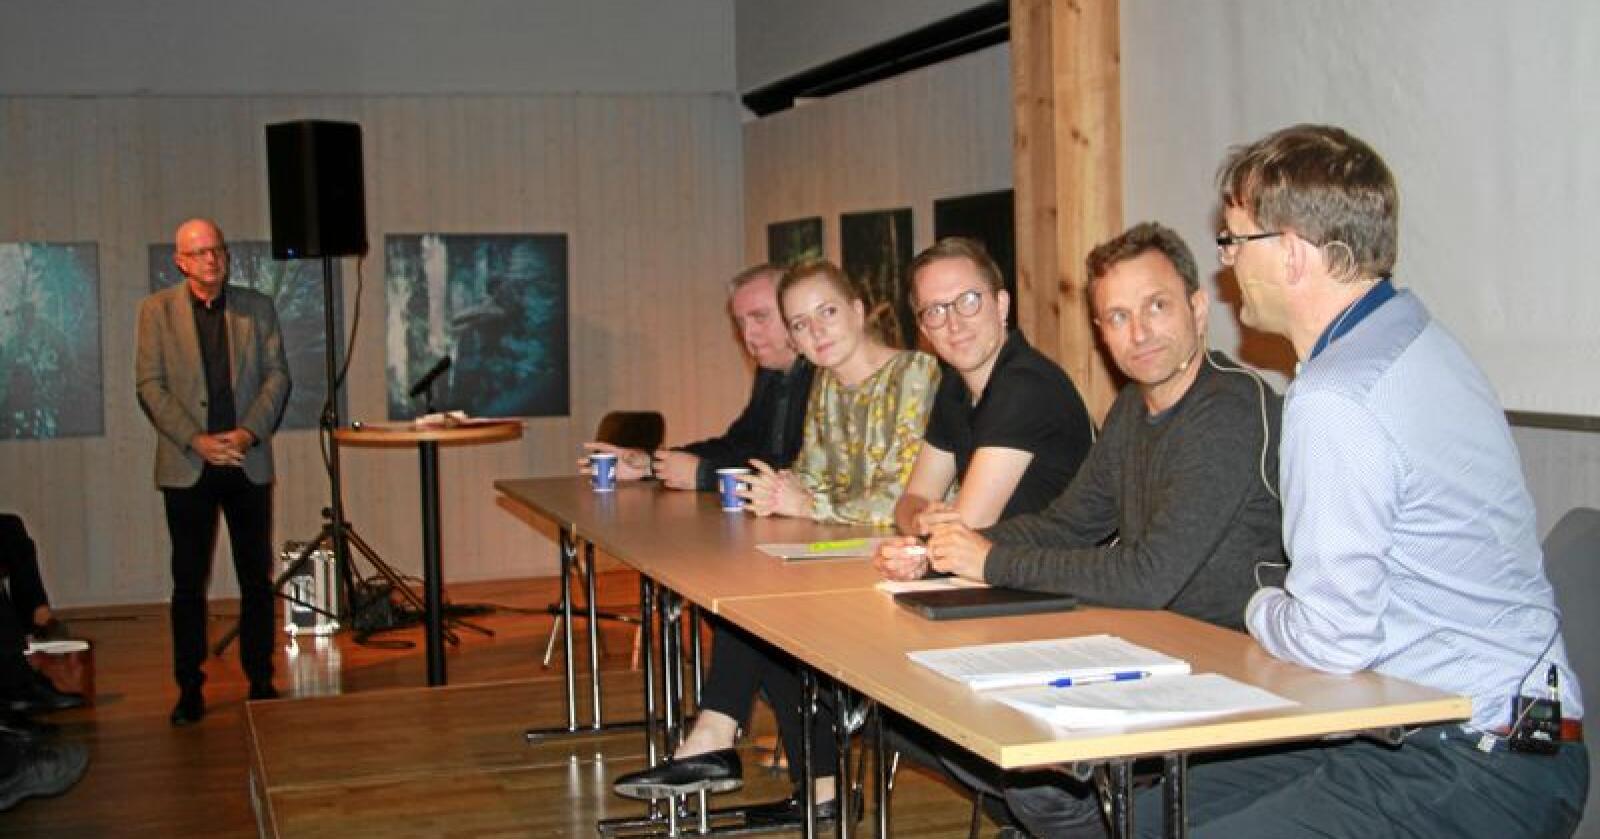 Torsdag var det seminar om næringsmuligheter i ulvesonen på Norsk skogmuseum i Elverum i Hedmark. Fra venstre ser vi debattleder Terje Svabø, Bjørn Jarle Røberg-Larsen (Ap). Emilie Enger Mehl (Sp), Kristian Tonning Riise (H), Arild Hermstad (MDG) og Widar Skogan (KrF). Foto: Svein Egil Hatlevik